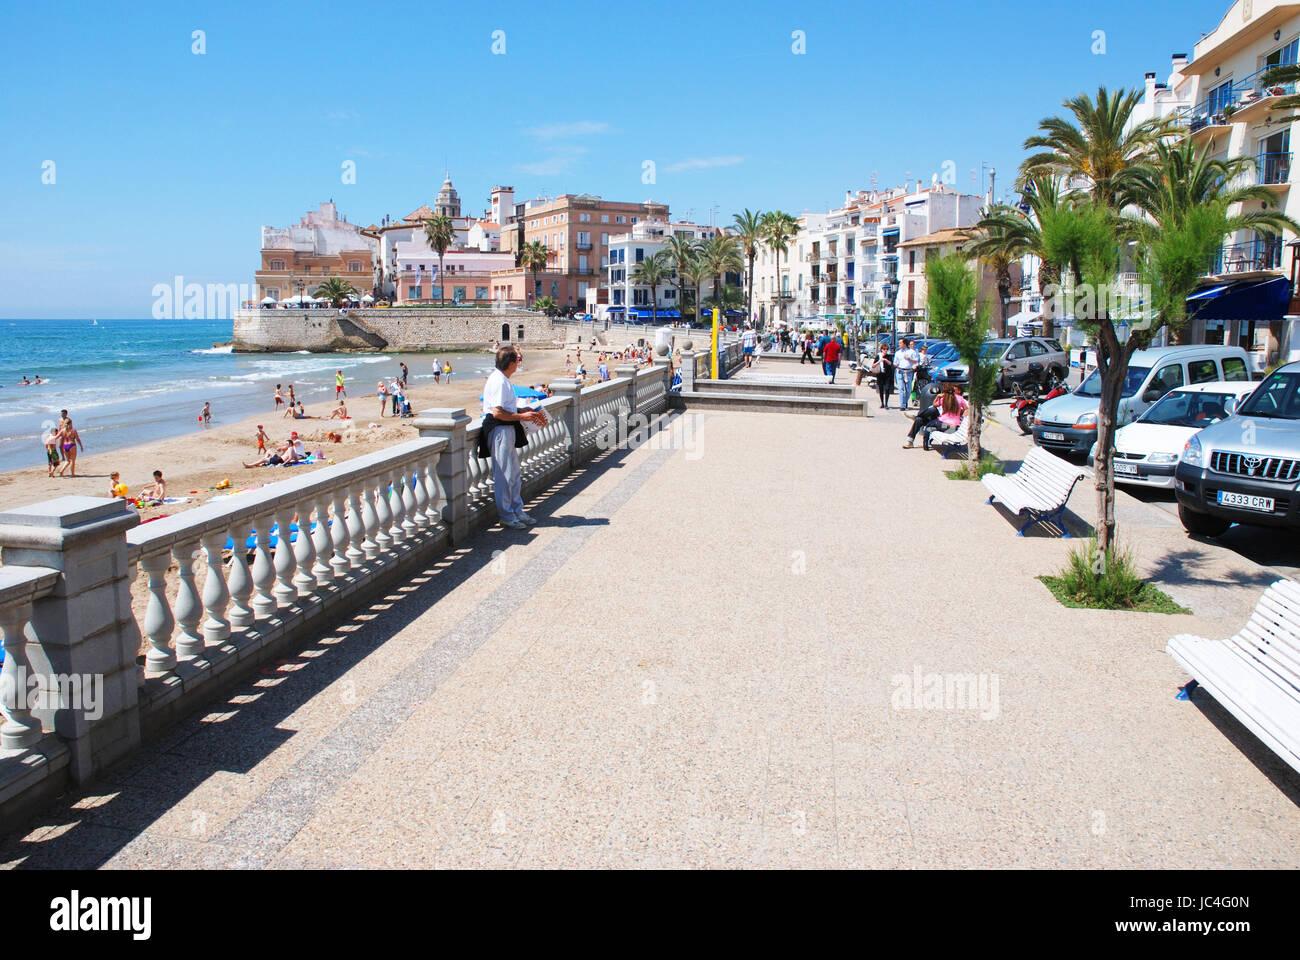 Promenade. Sitges, Barcelona province, Catalonia, Spain. - Stock Image